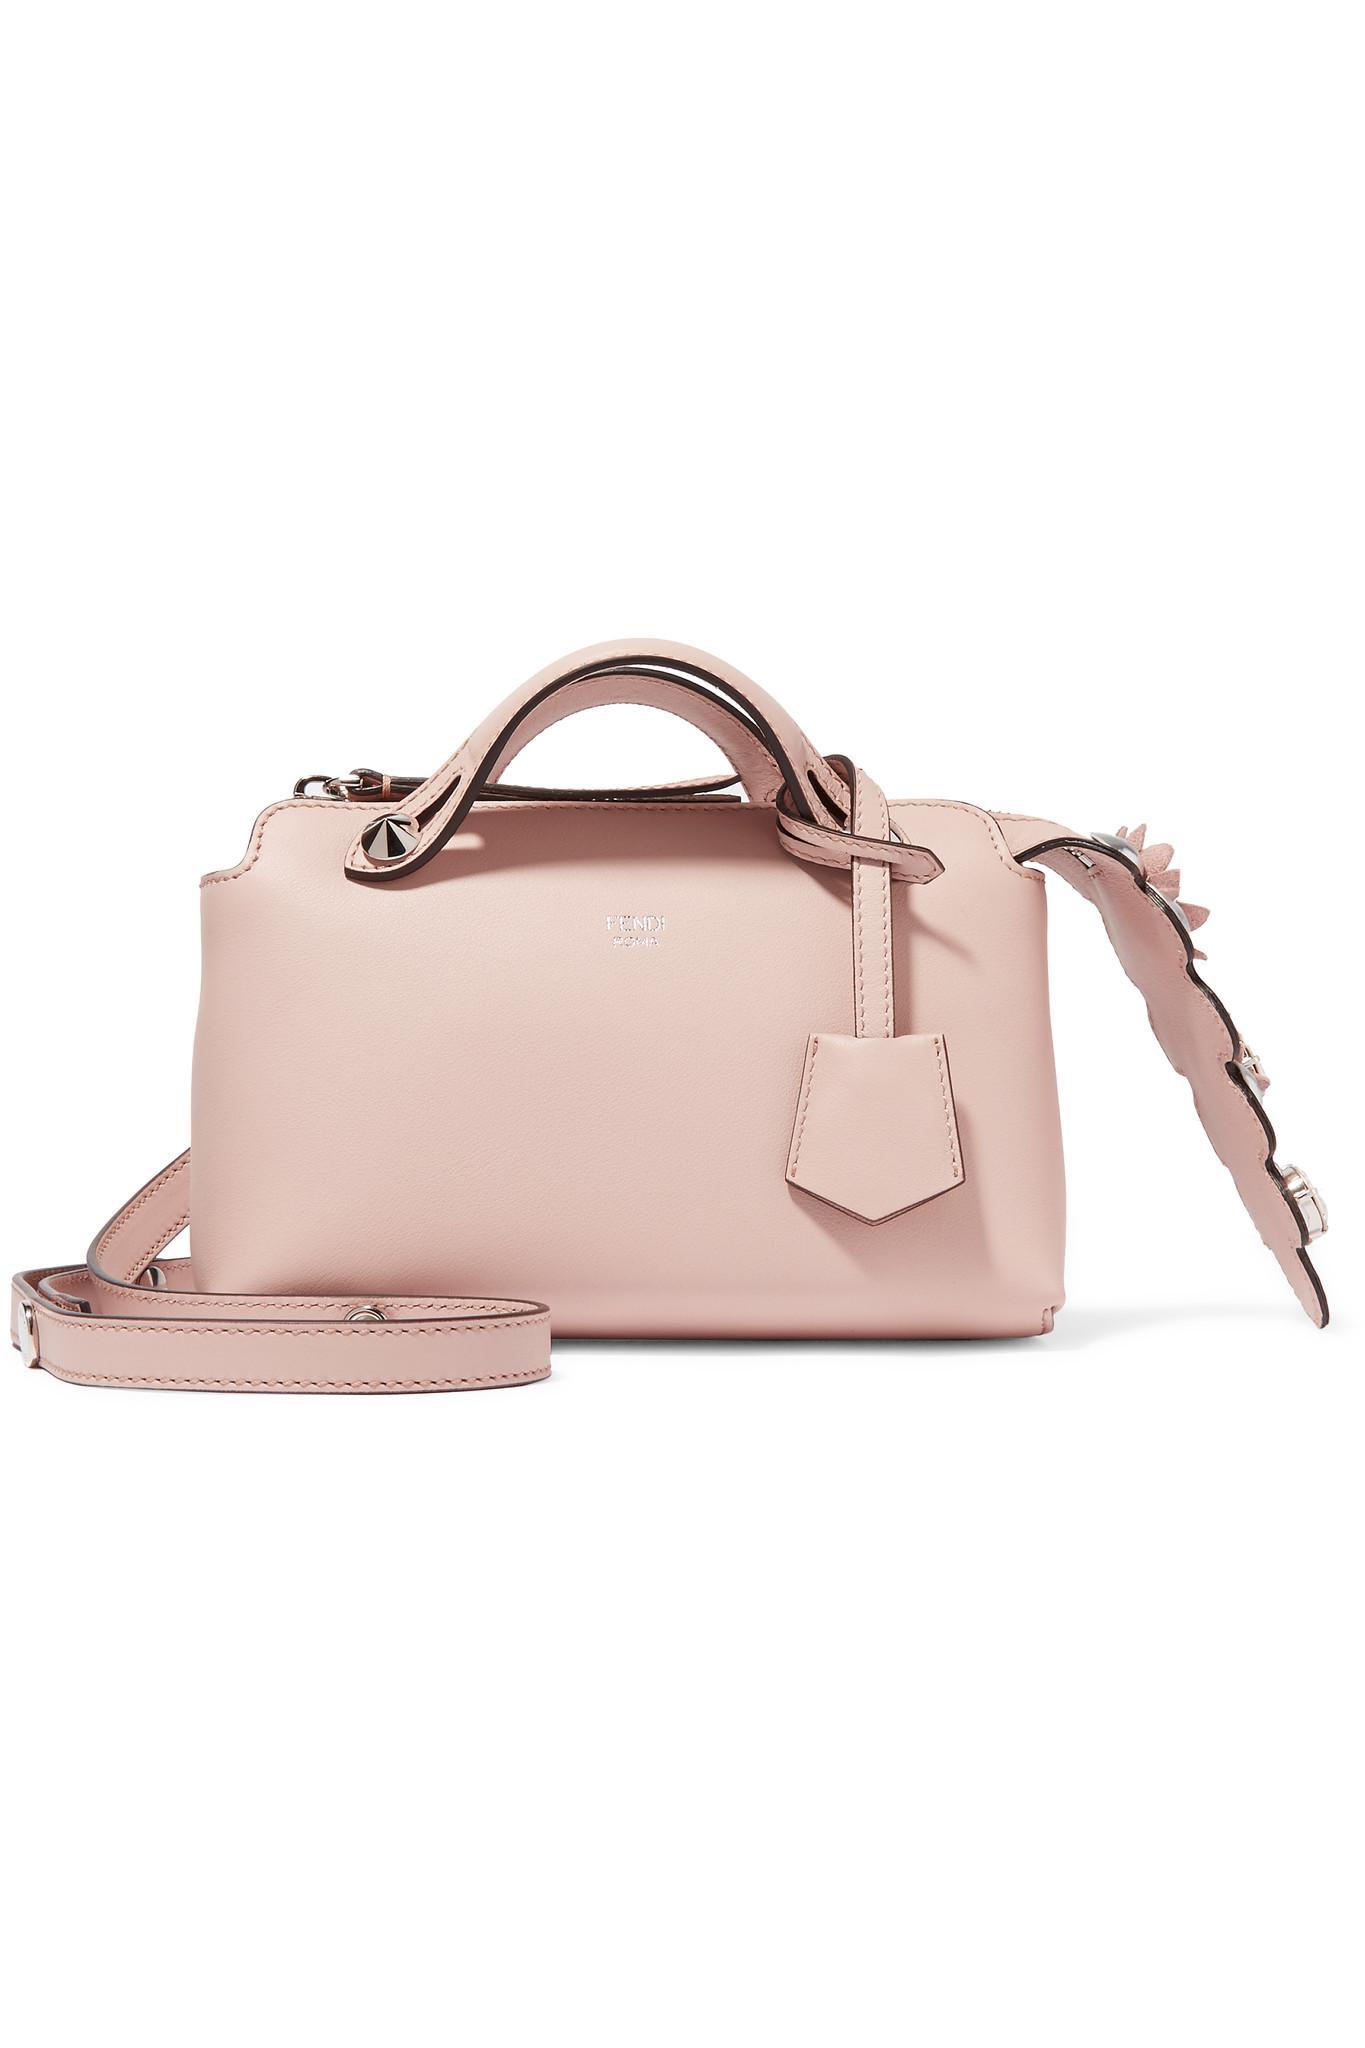 68f25e8f1832 Lyst - Fendi Mini  by The Way  Crossbody Bag